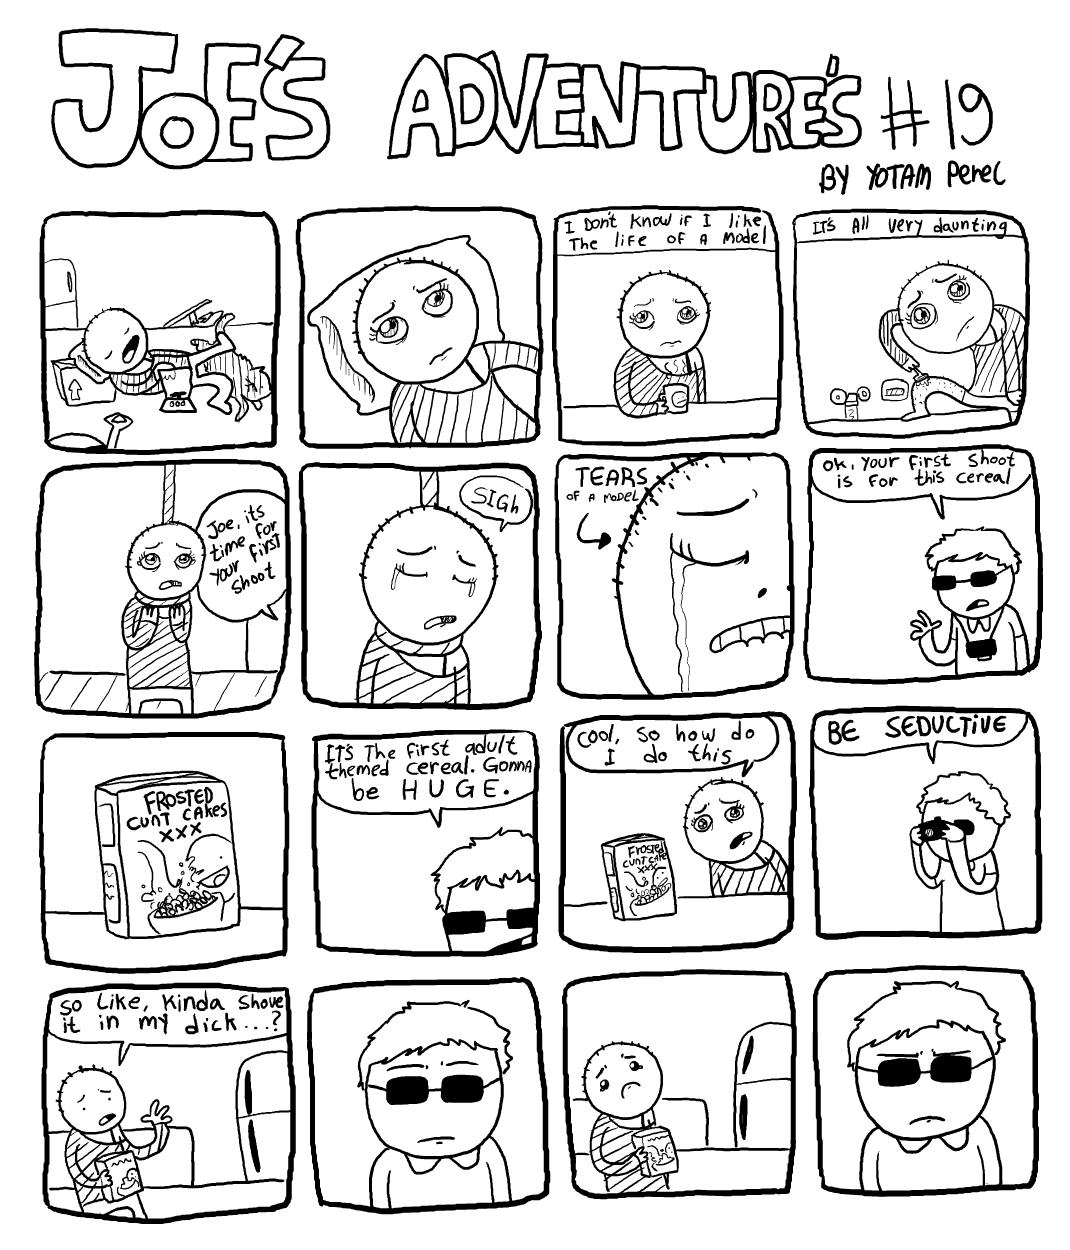 Joe's Adventure's 19